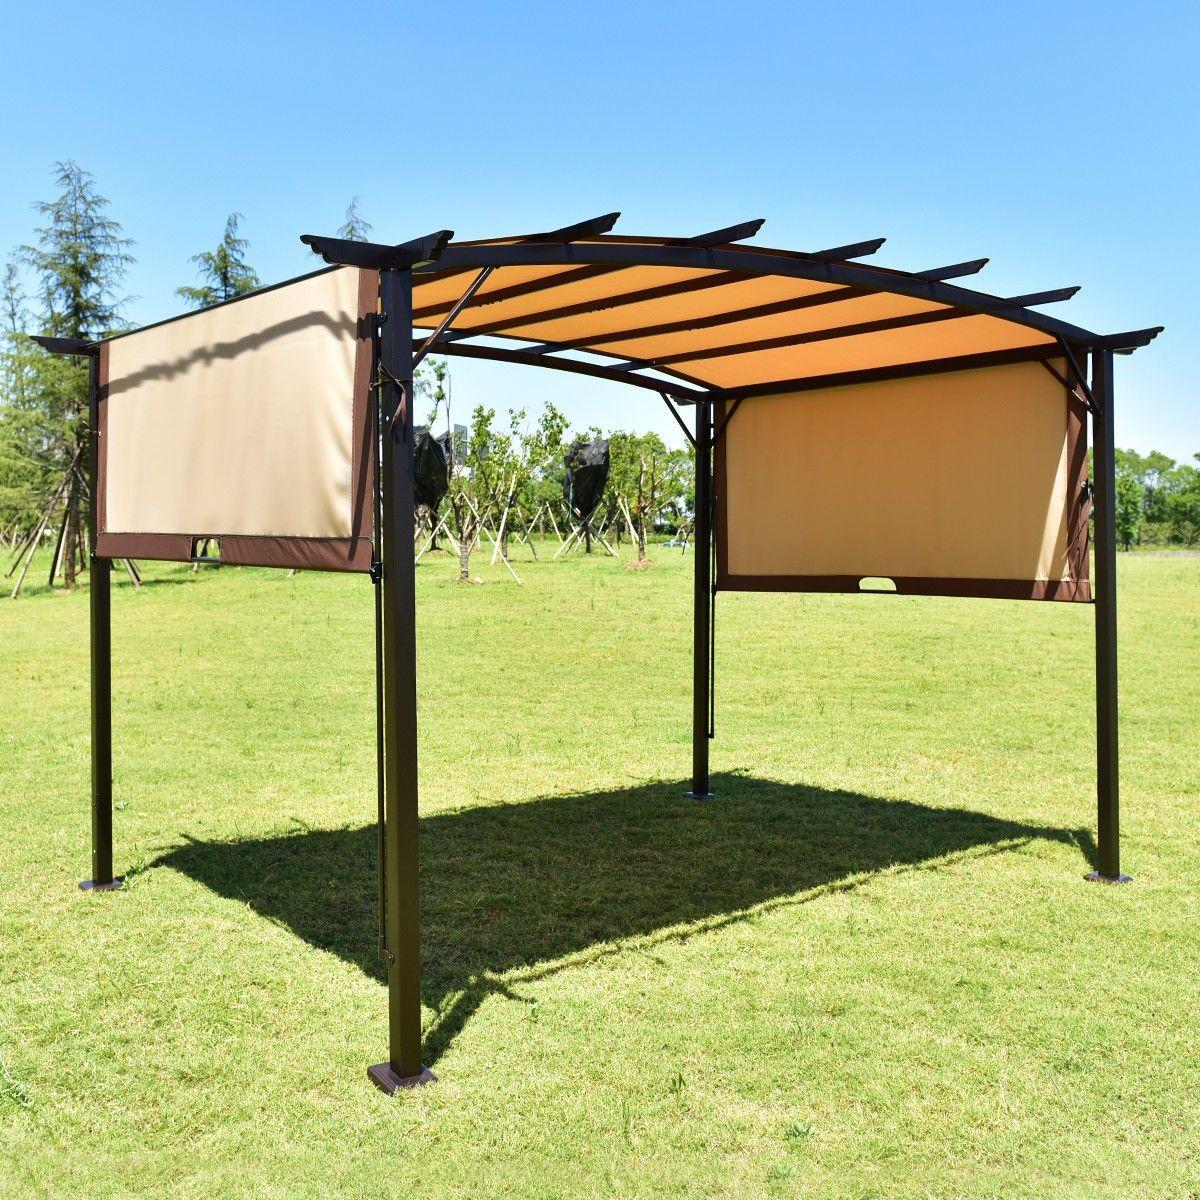 12 X 9 Pergola Kit Metal Frame Grape Gazebo Canopy Cover